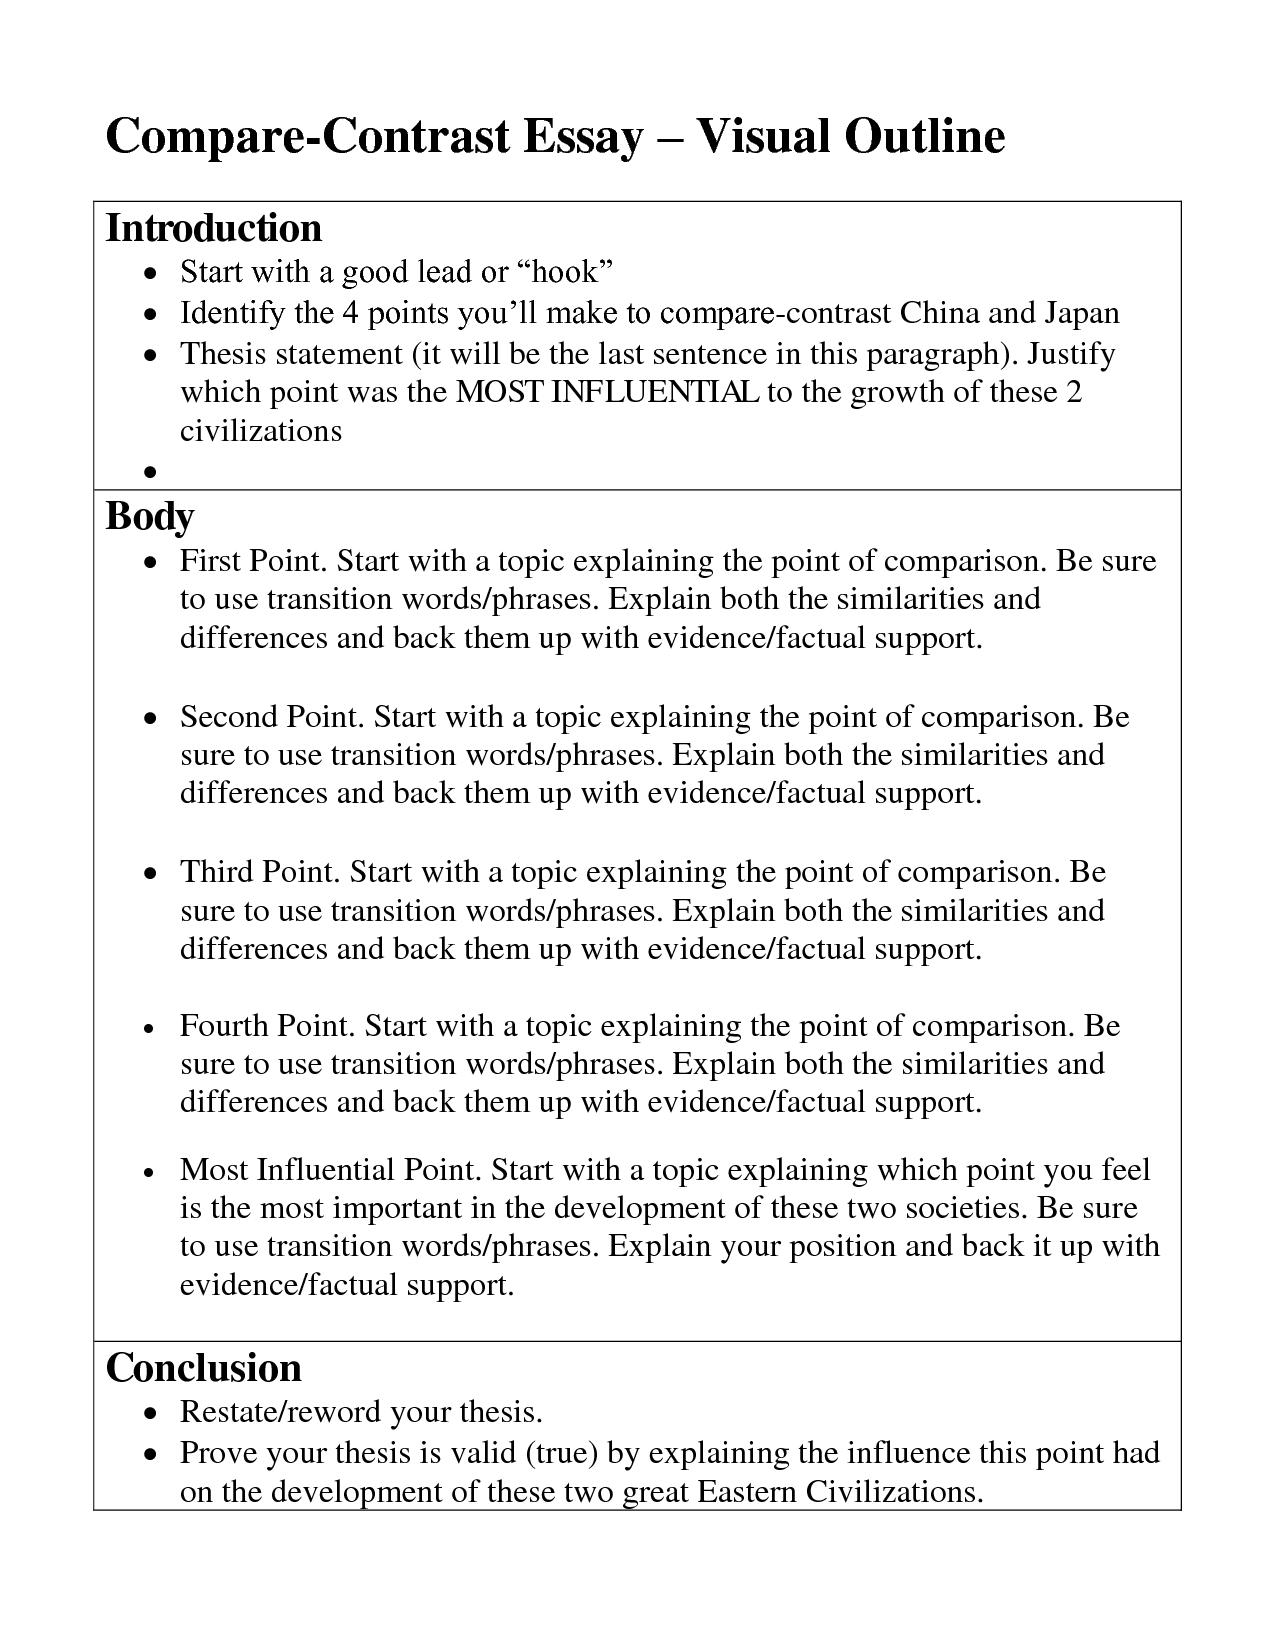 Search incep imagine ex. Agenda clipart essay outline